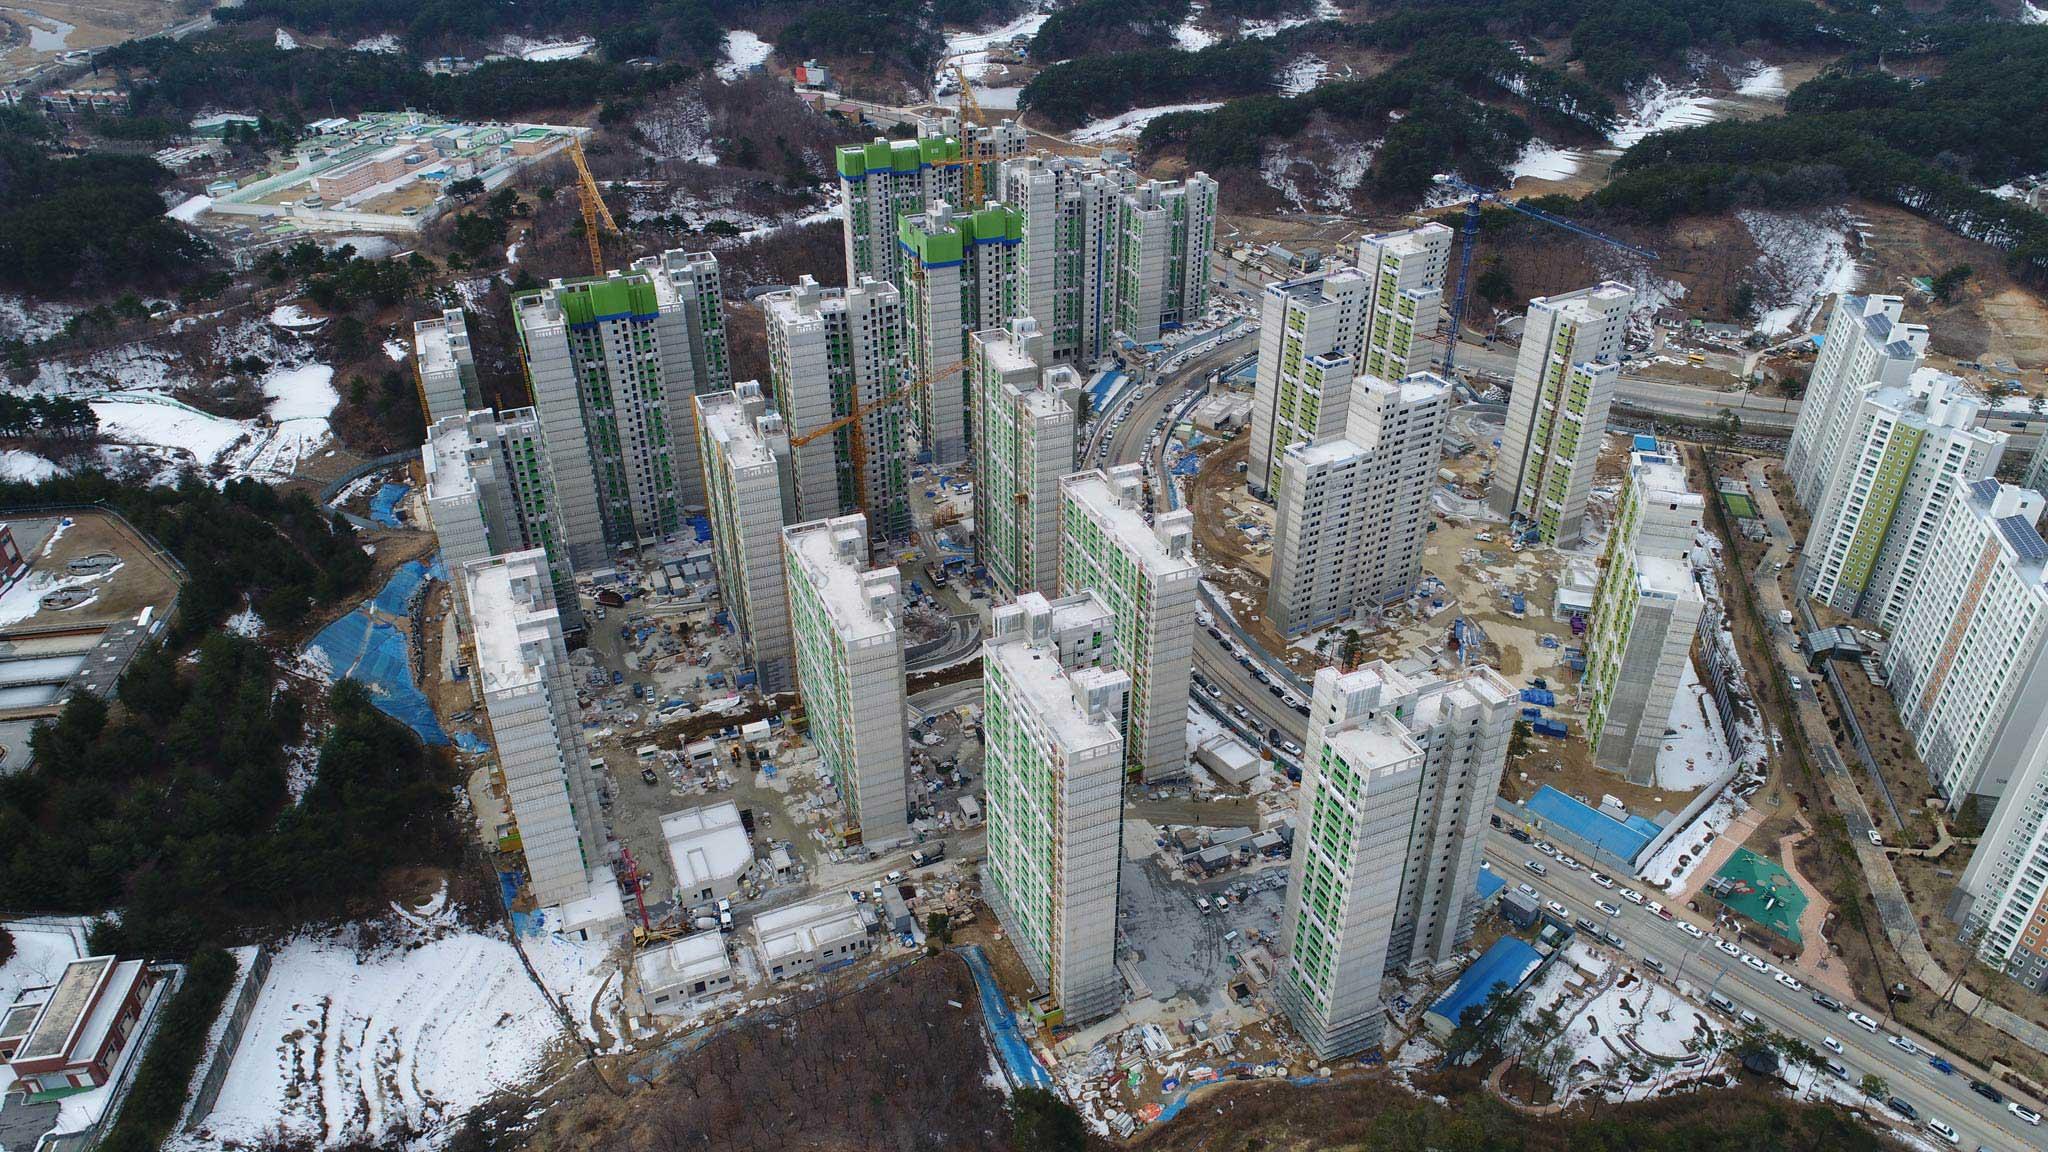 Das Media Village aus der Vogelperspektive - Foto: olympic.org/photos/pyeongchang-2018/venues